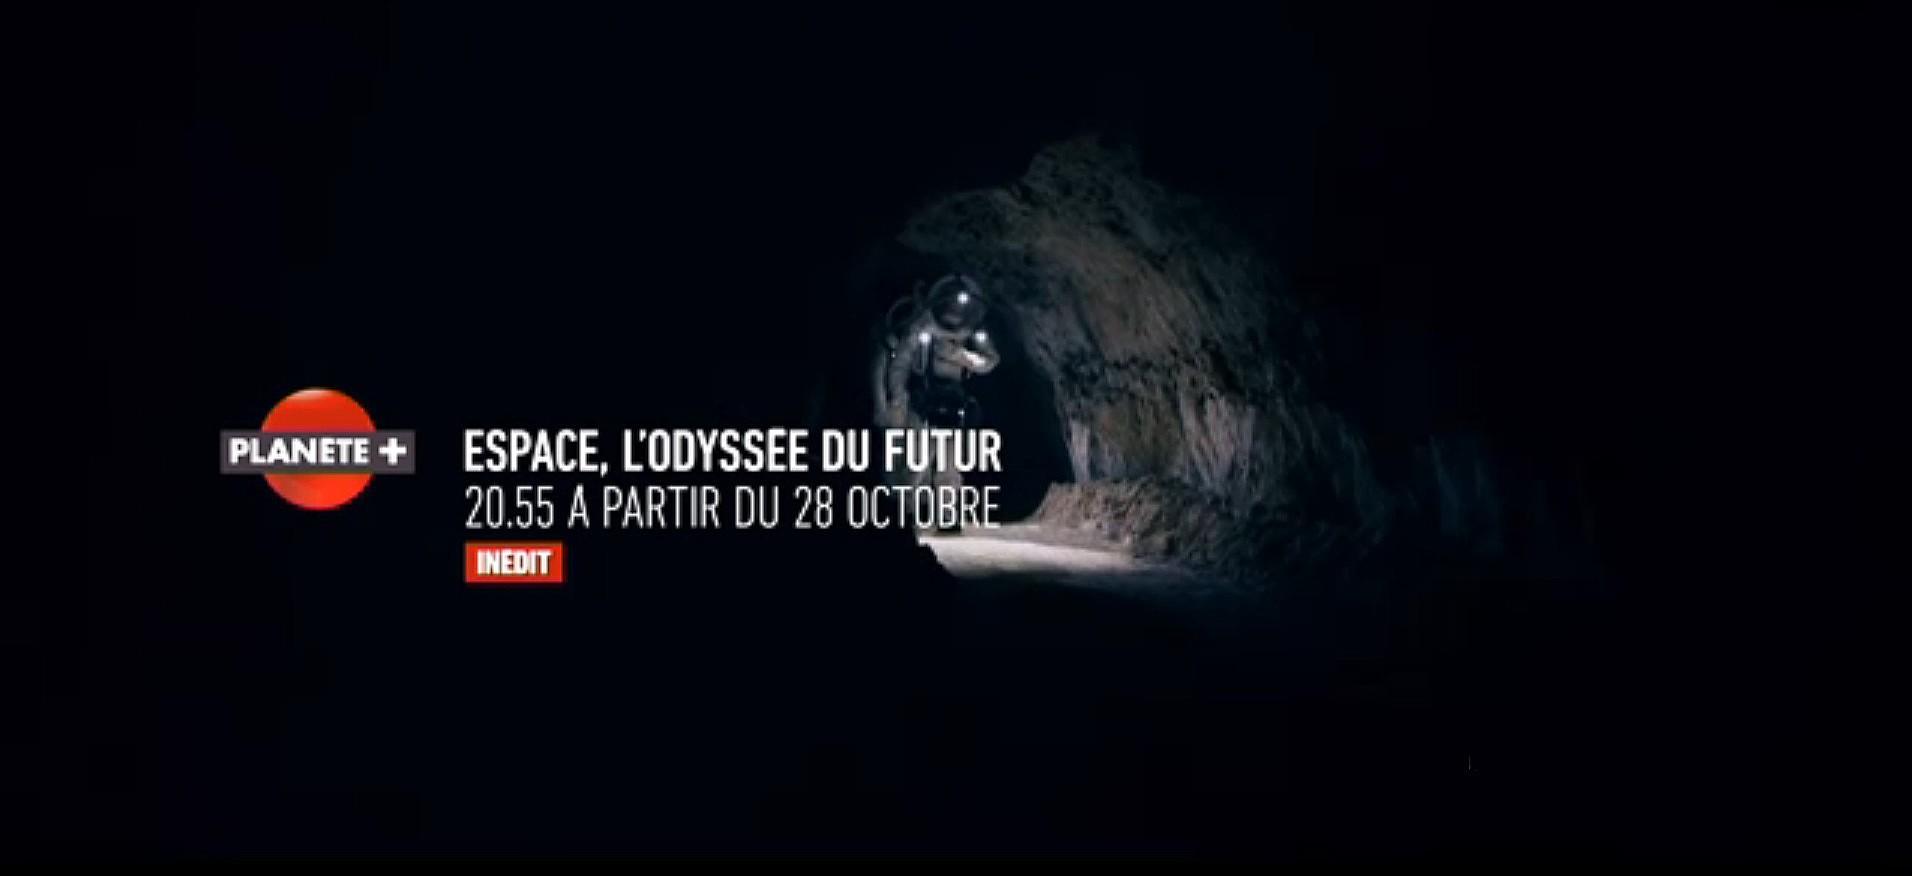 grotte-1-grd-format